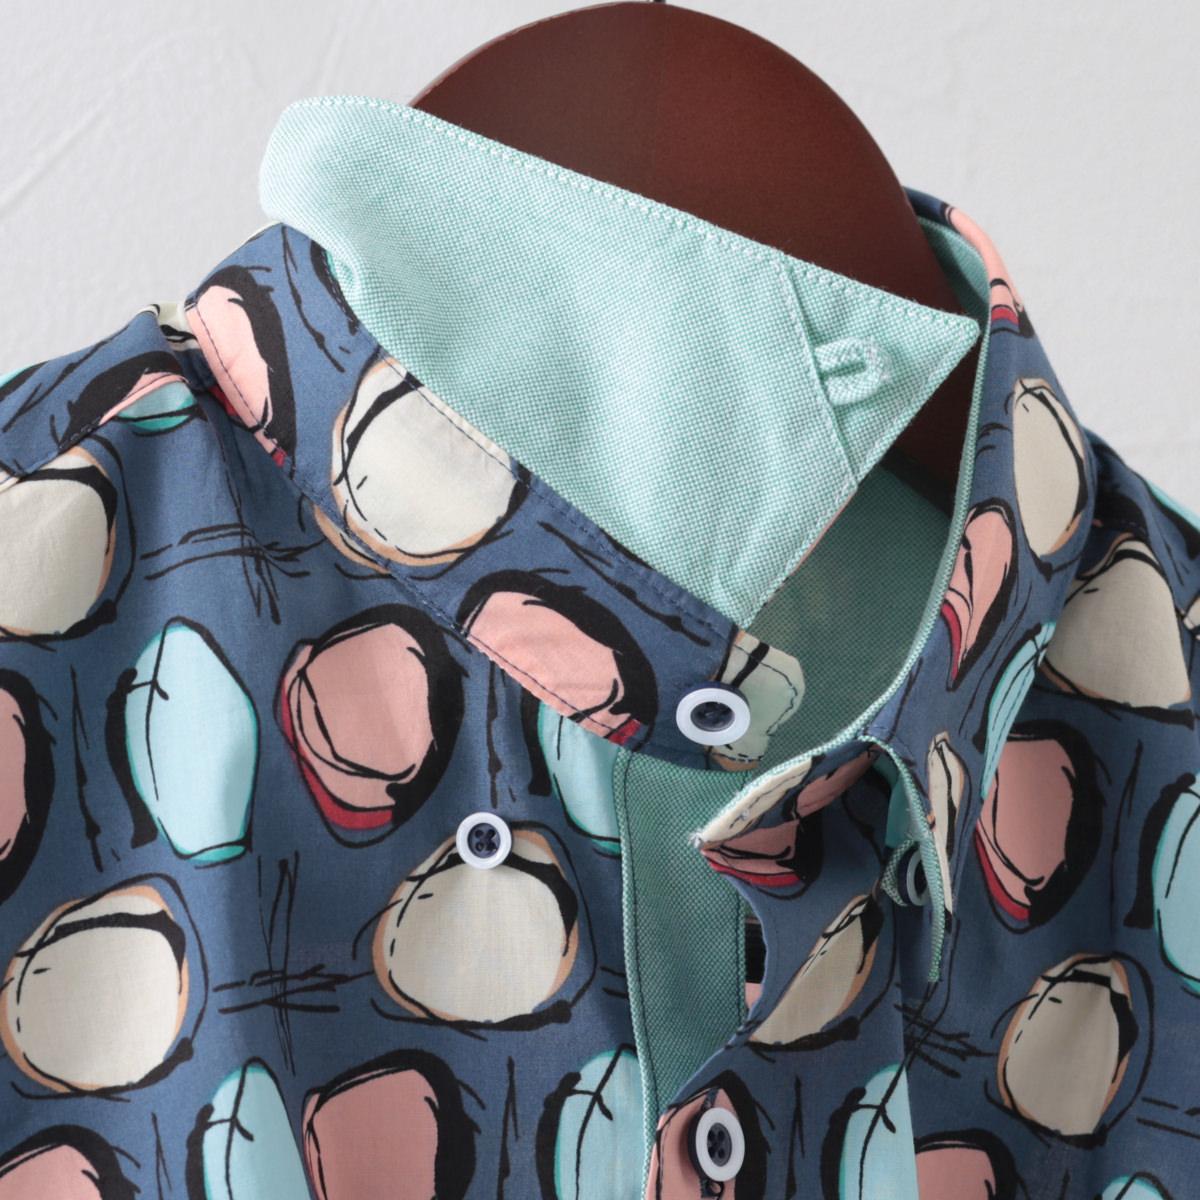 Gabicci メンズ 半袖シャツ サークル ガビッチ コロン レトロ モッズファッション